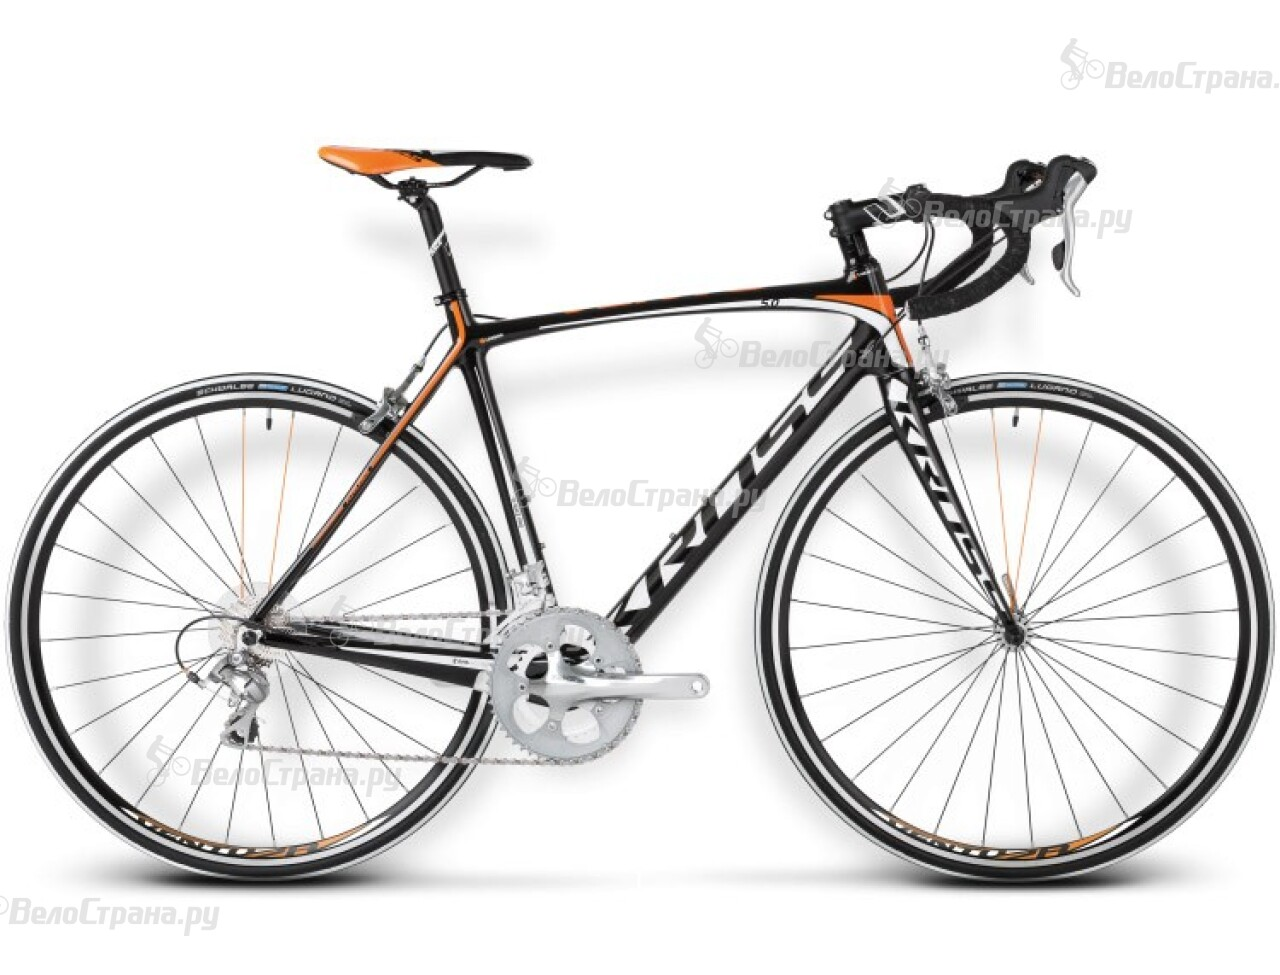 Велосипед Kross Vento 5.0 (2015) велосипед kross pulso 1 2015